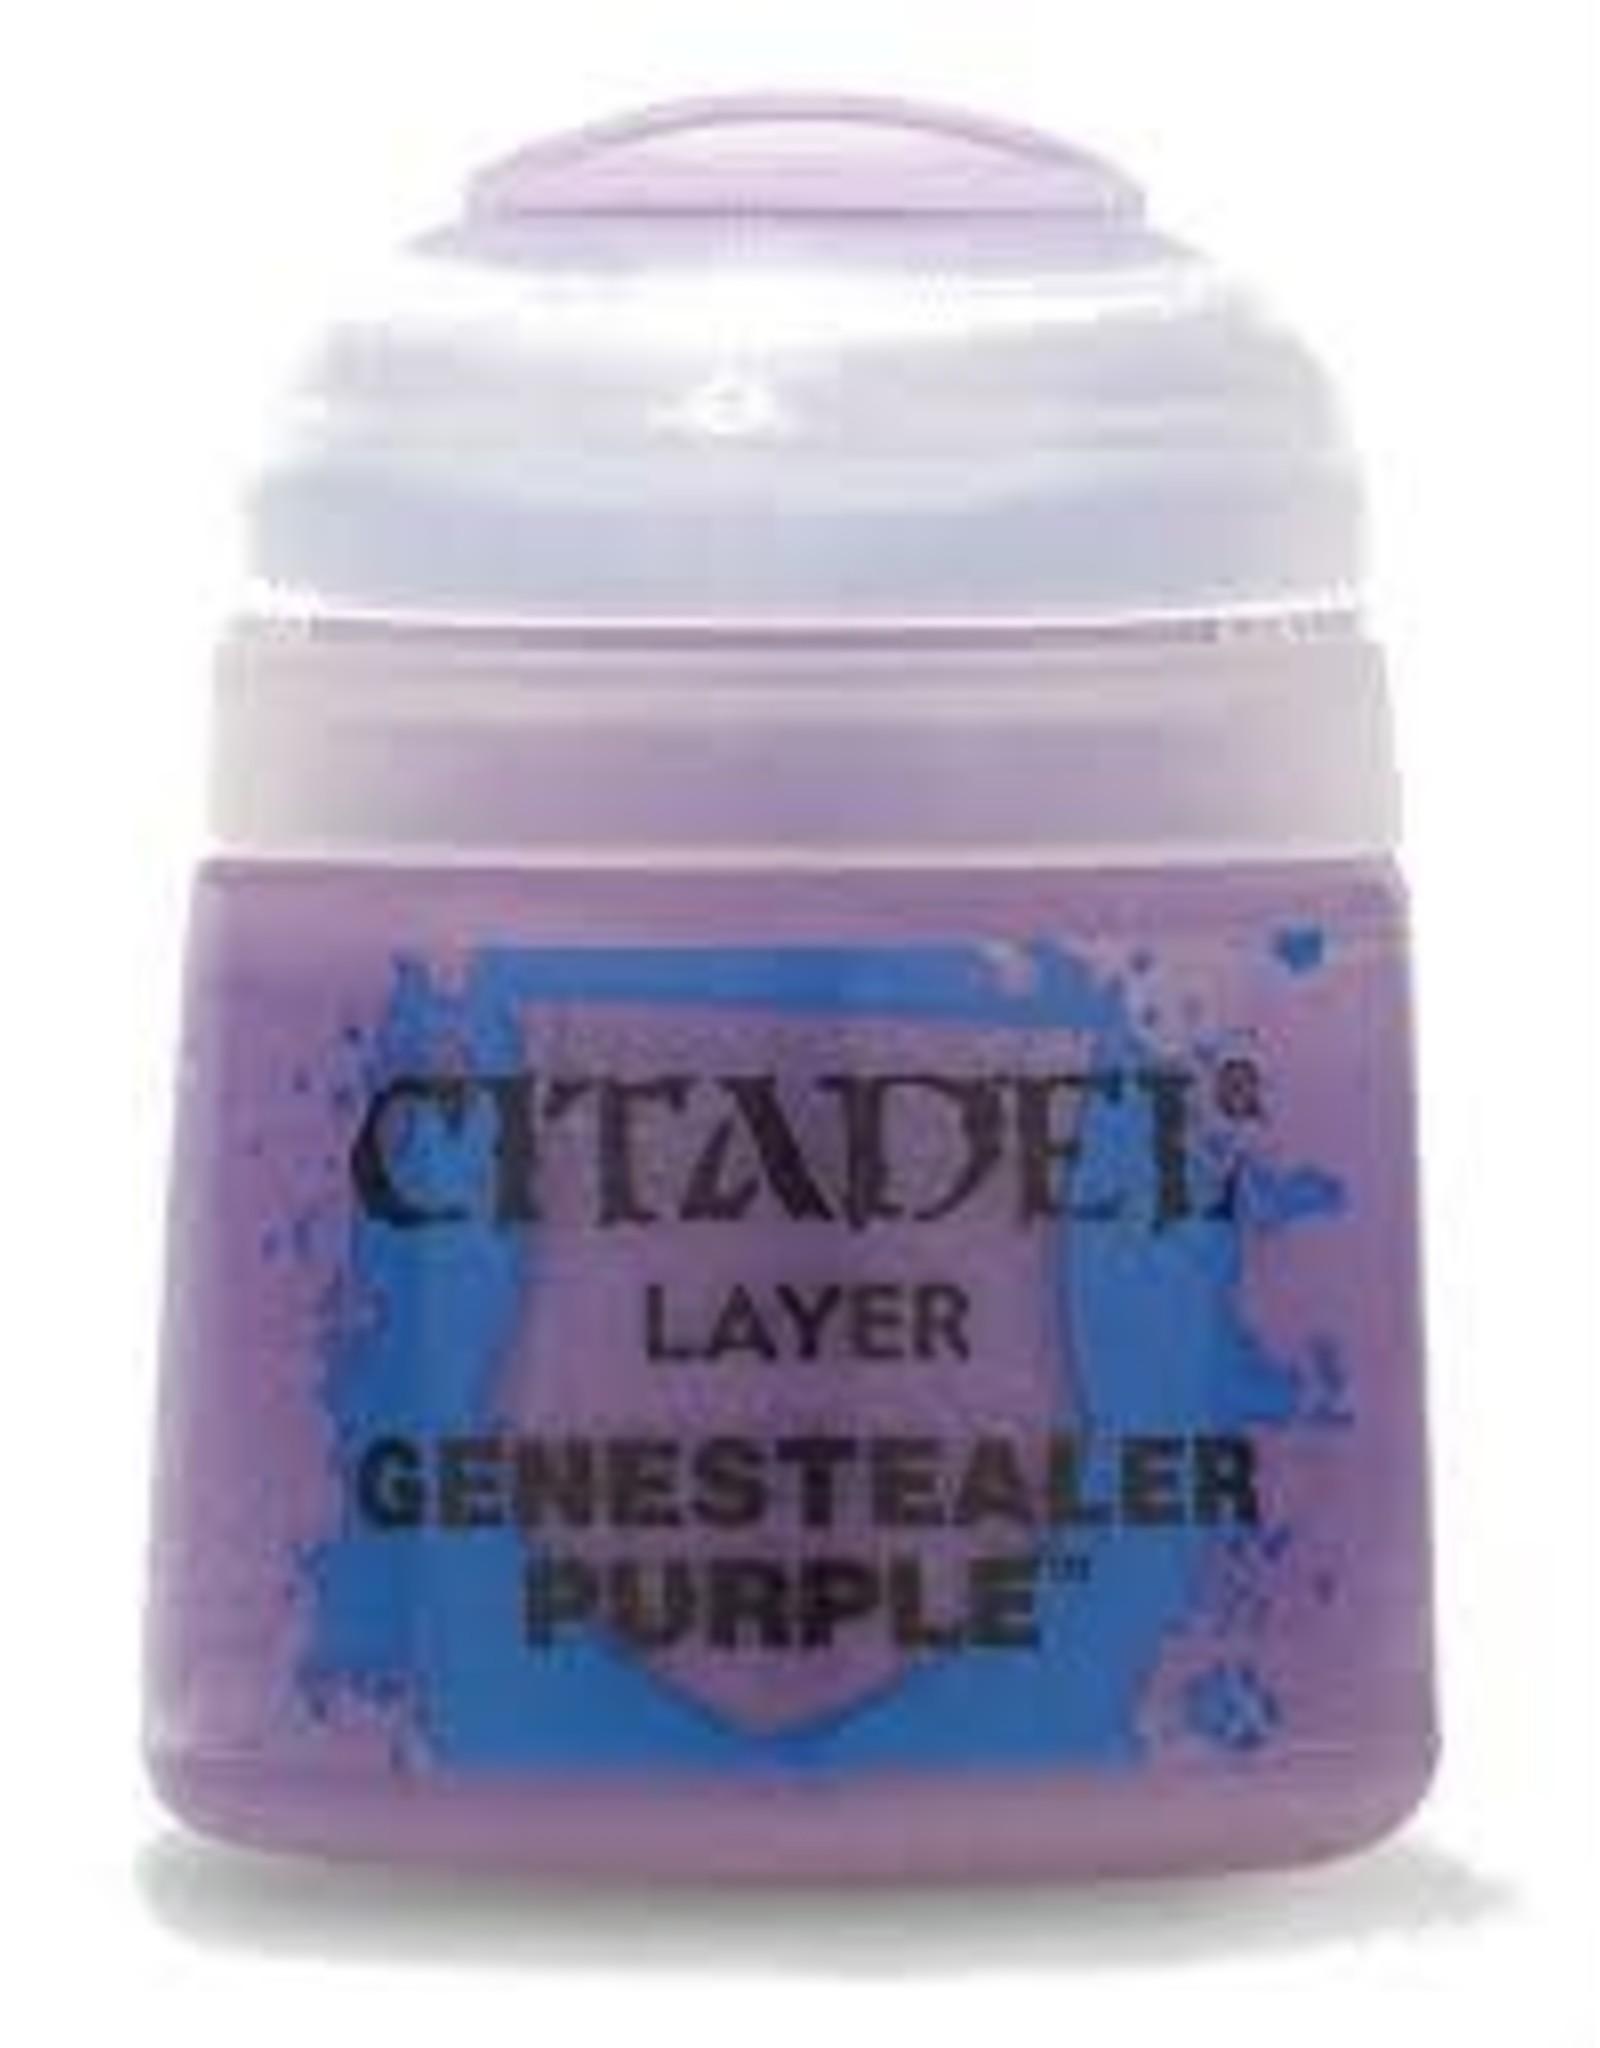 Games Workshop Citadel Paint: Genestealer Purple 12ml